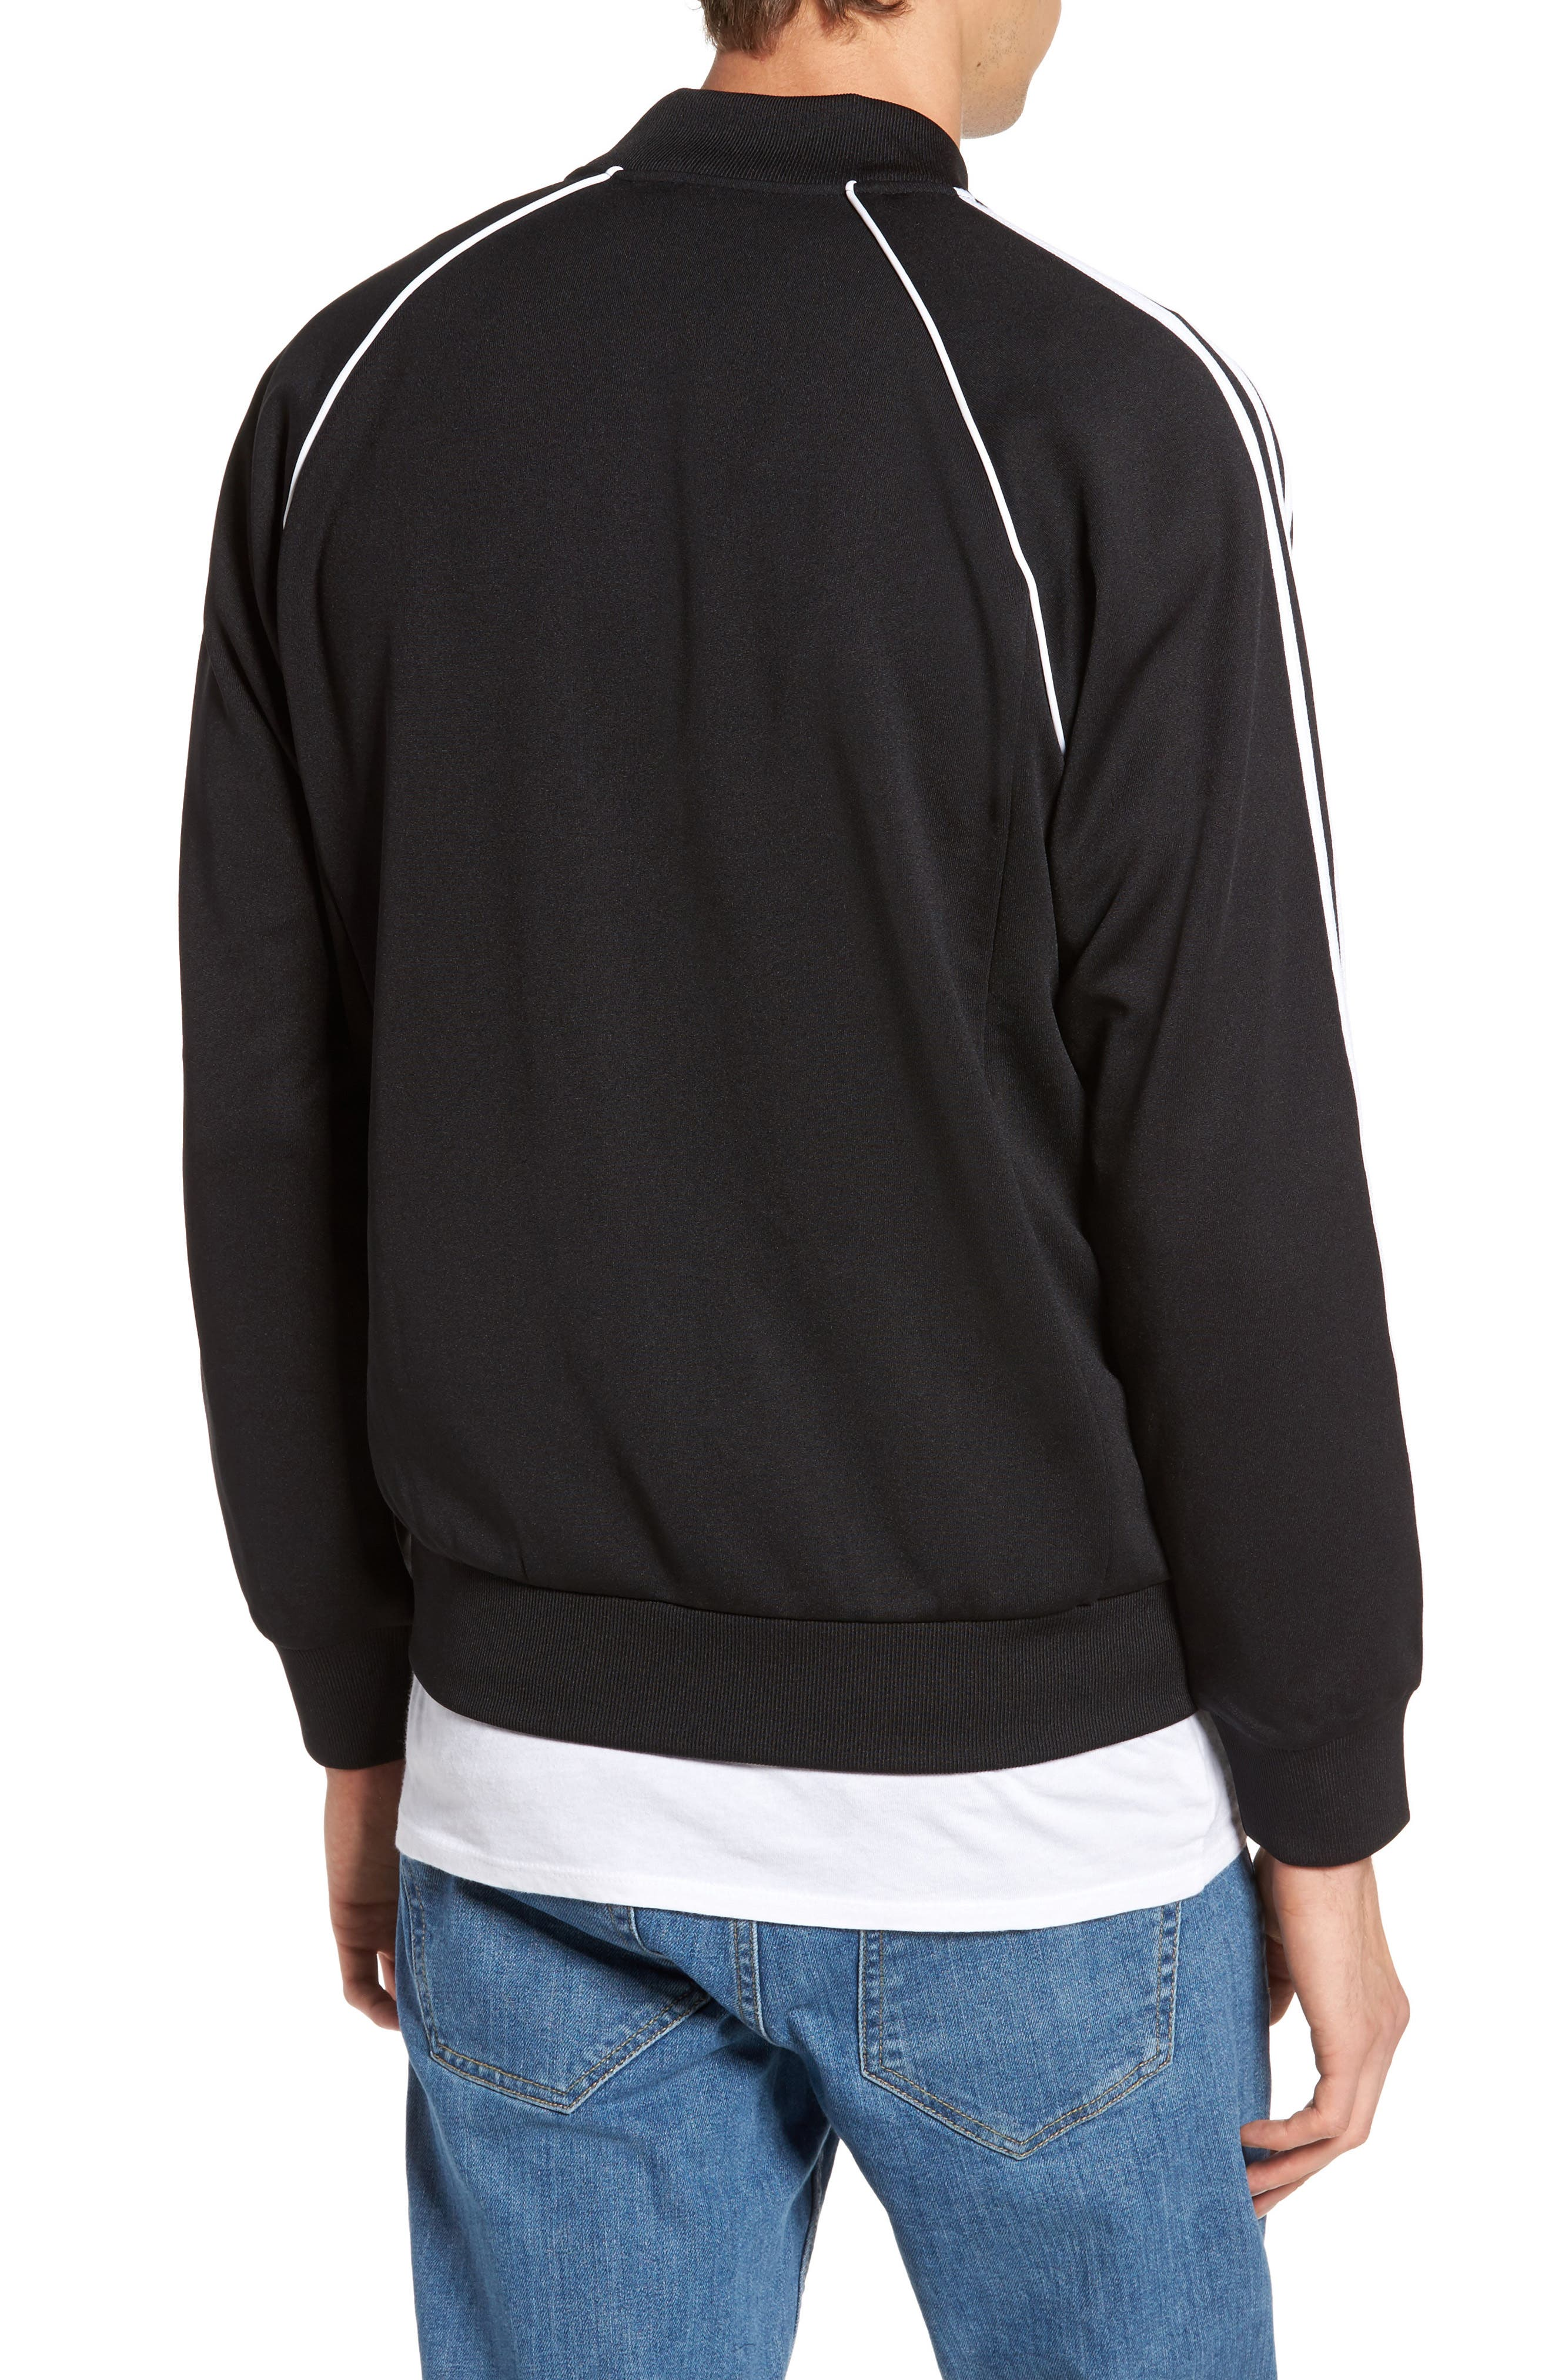 ADIDAS ORIGINALS, SST Track Jacket, Alternate thumbnail 2, color, BLACK